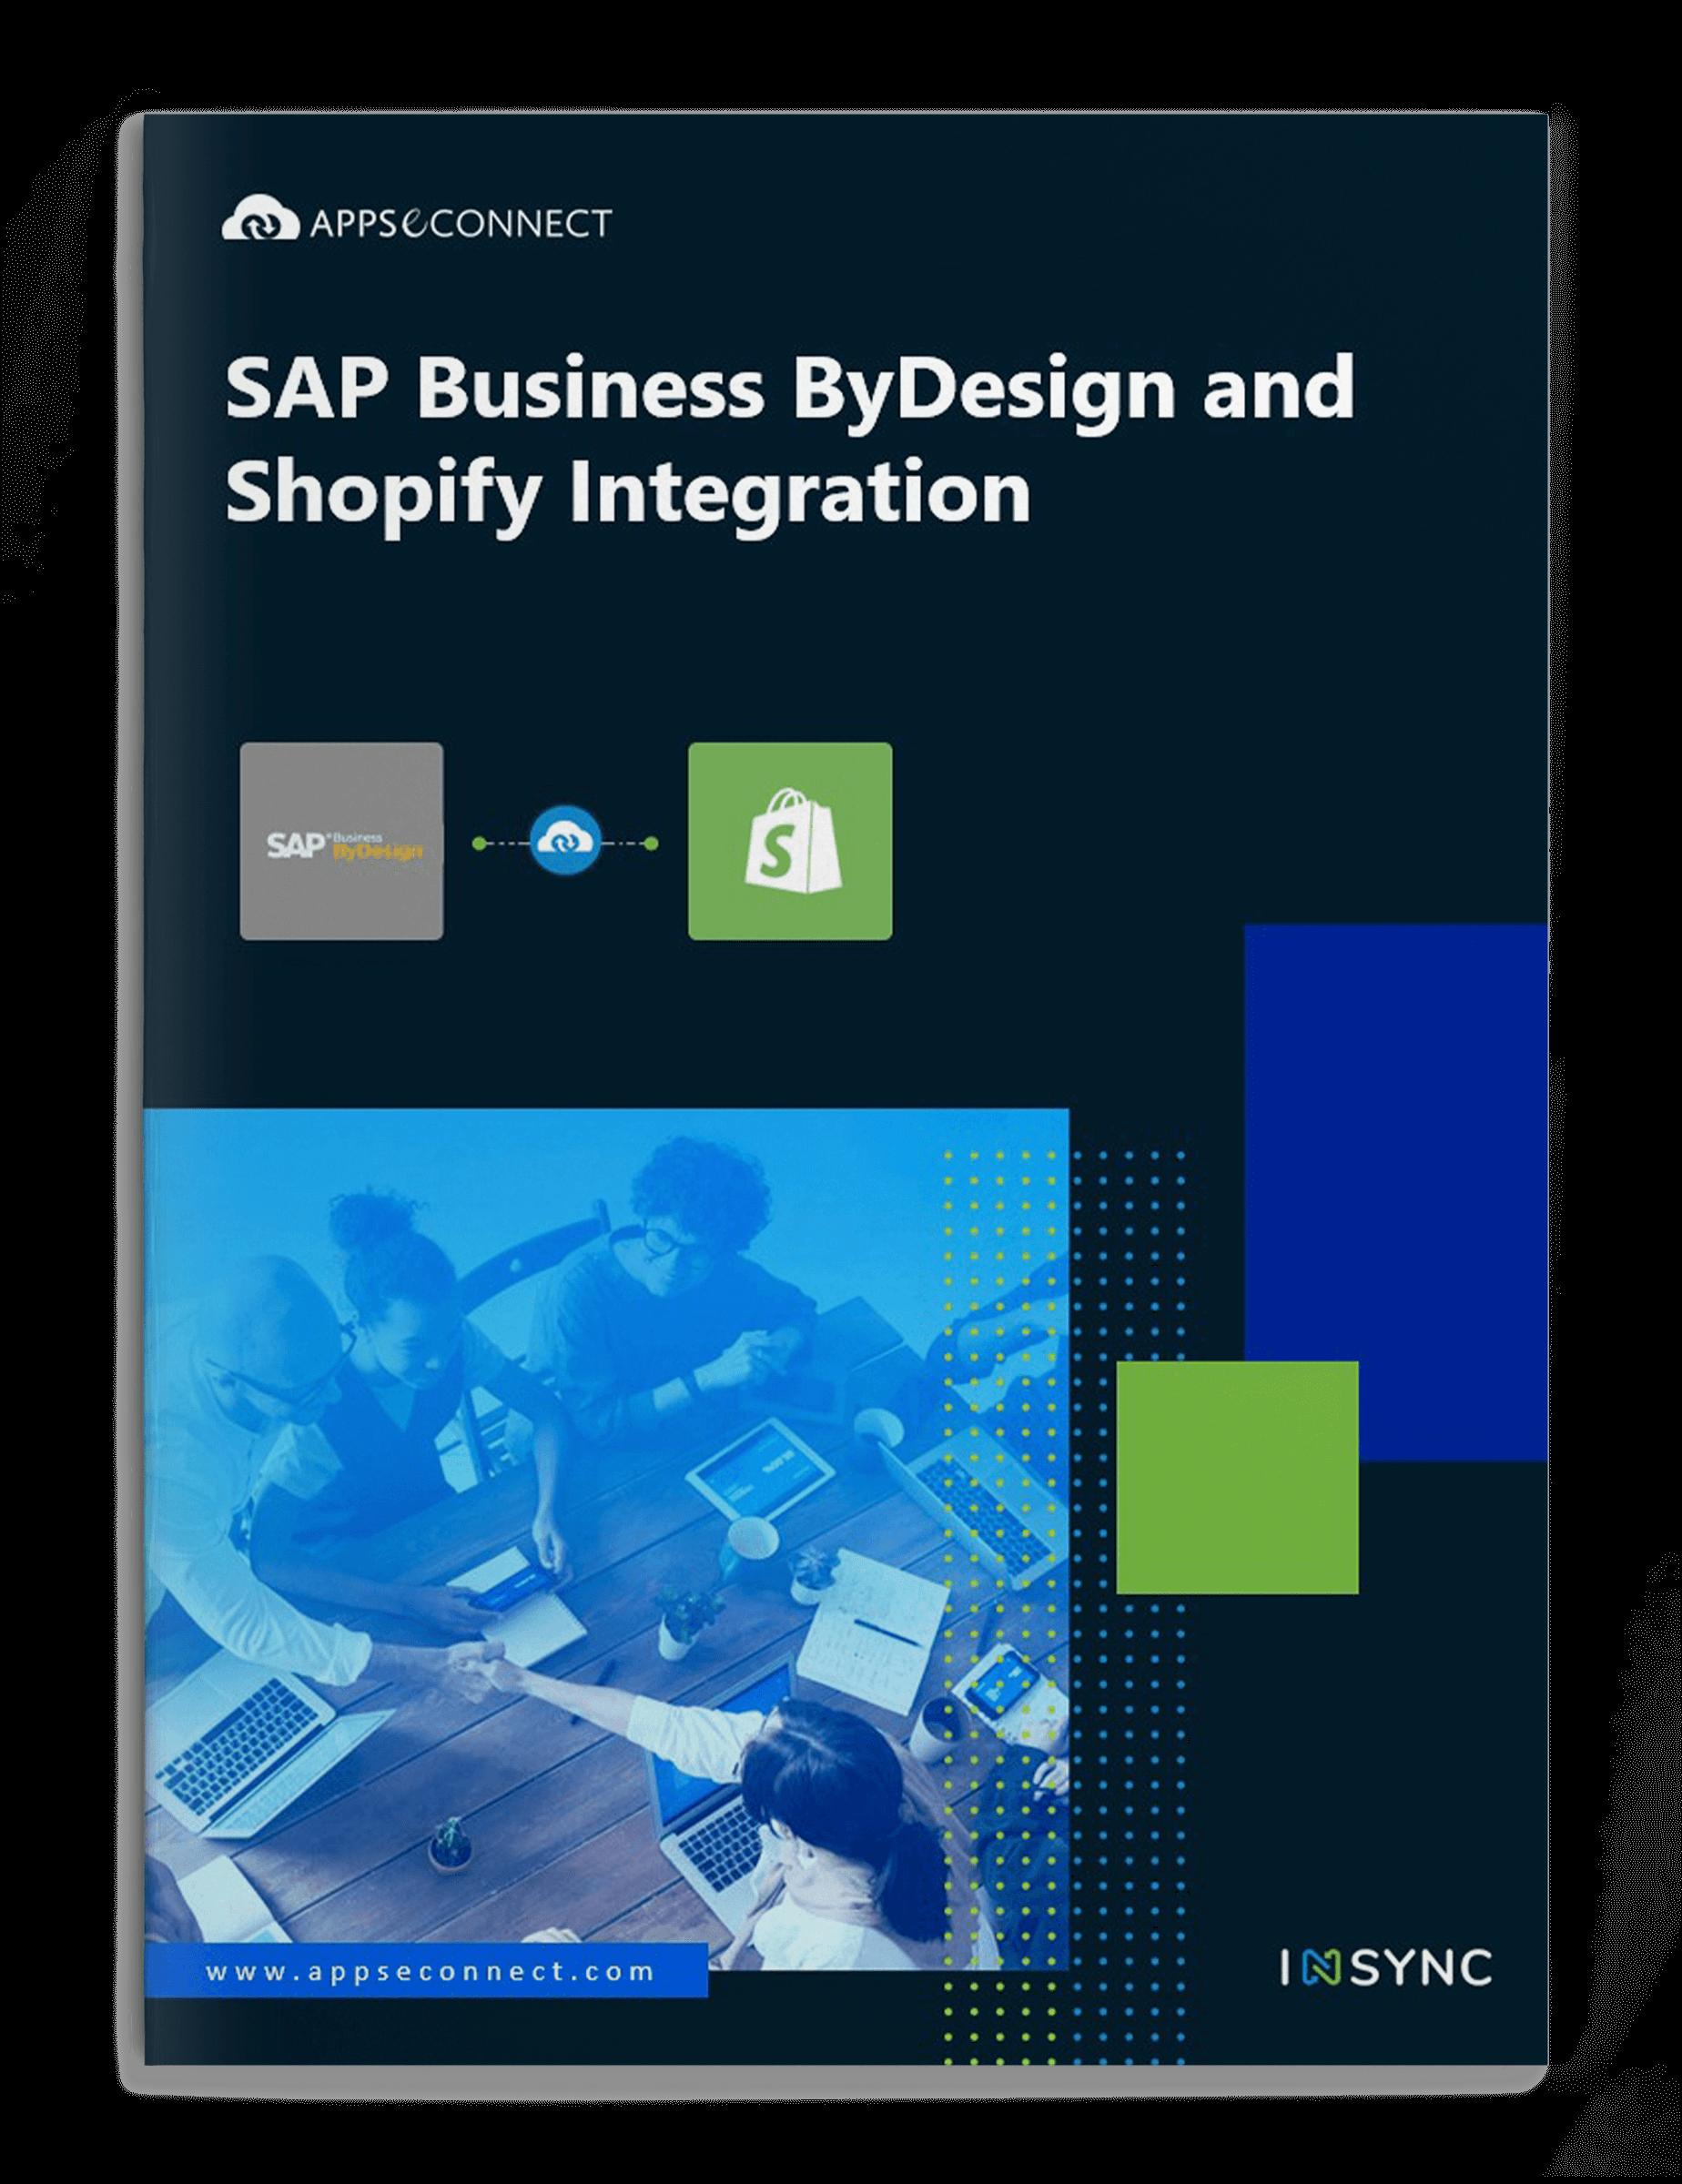 sap-business-bydesign-shopify-integration-brochure-cover